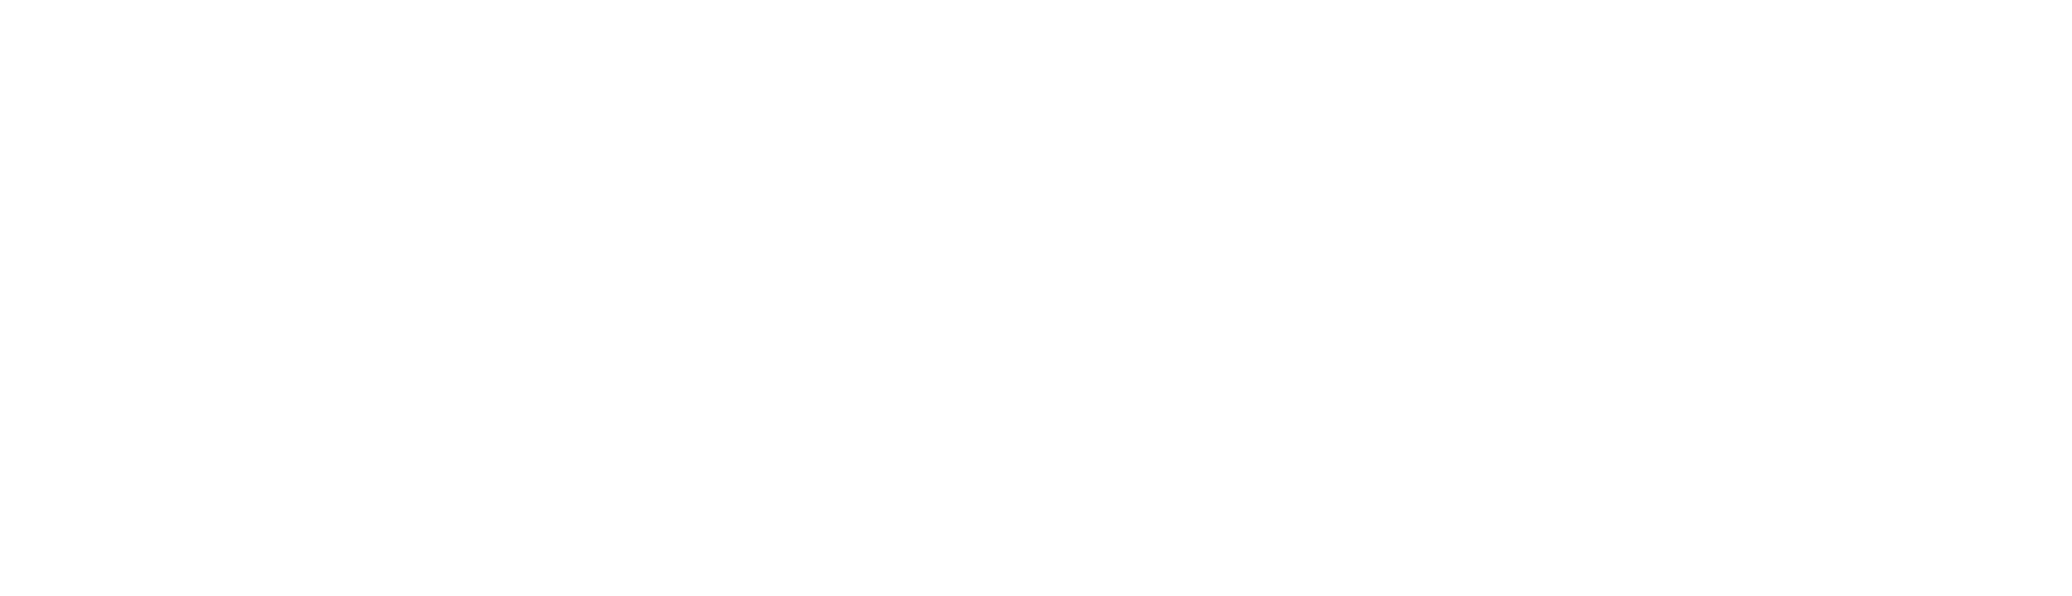 nafukovaciatrakce.cz